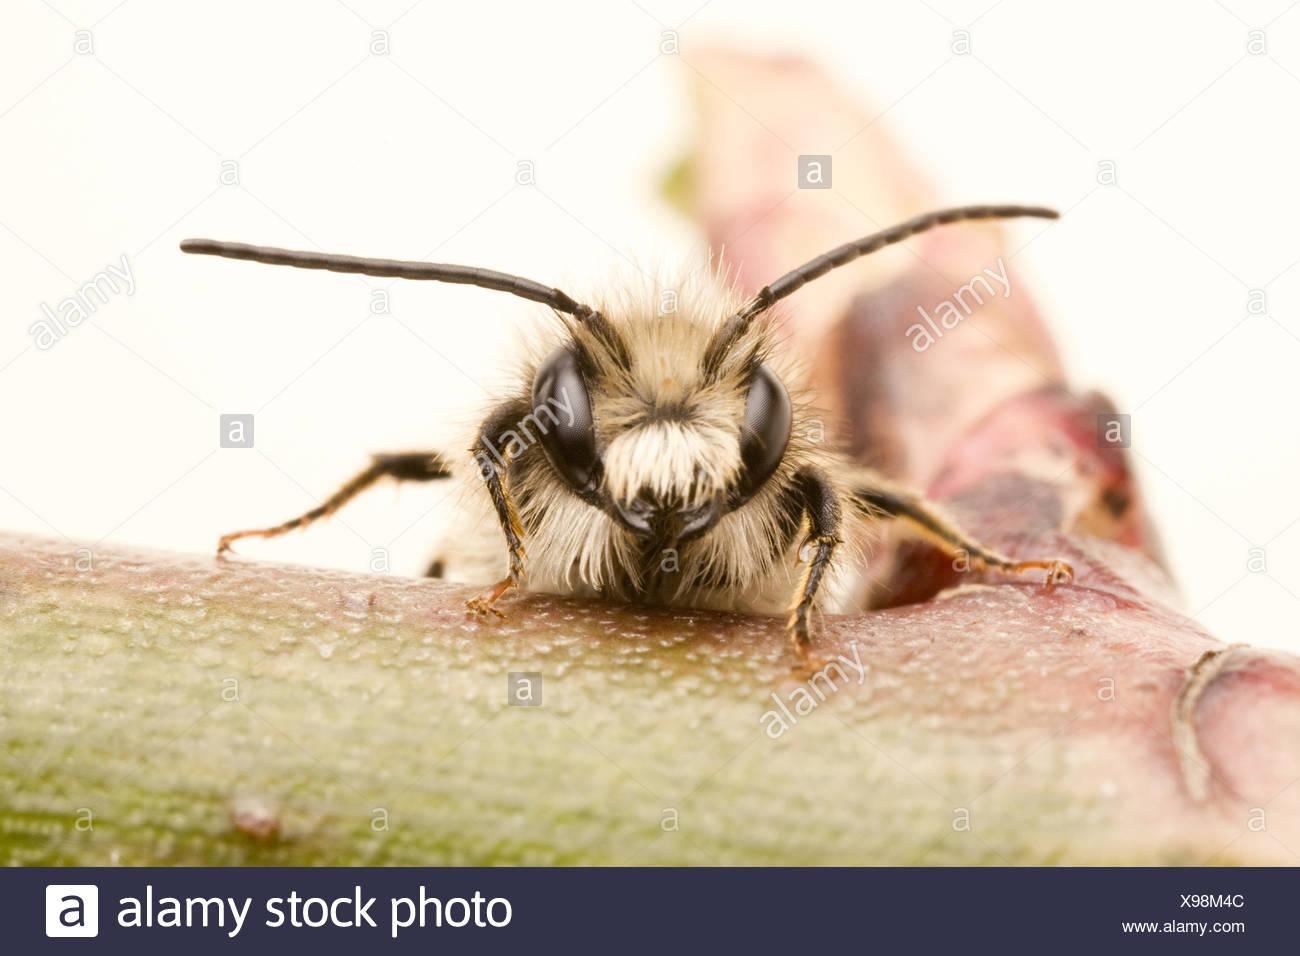 Mauerbiene - Mauerbienen (Osmia) Stockbild